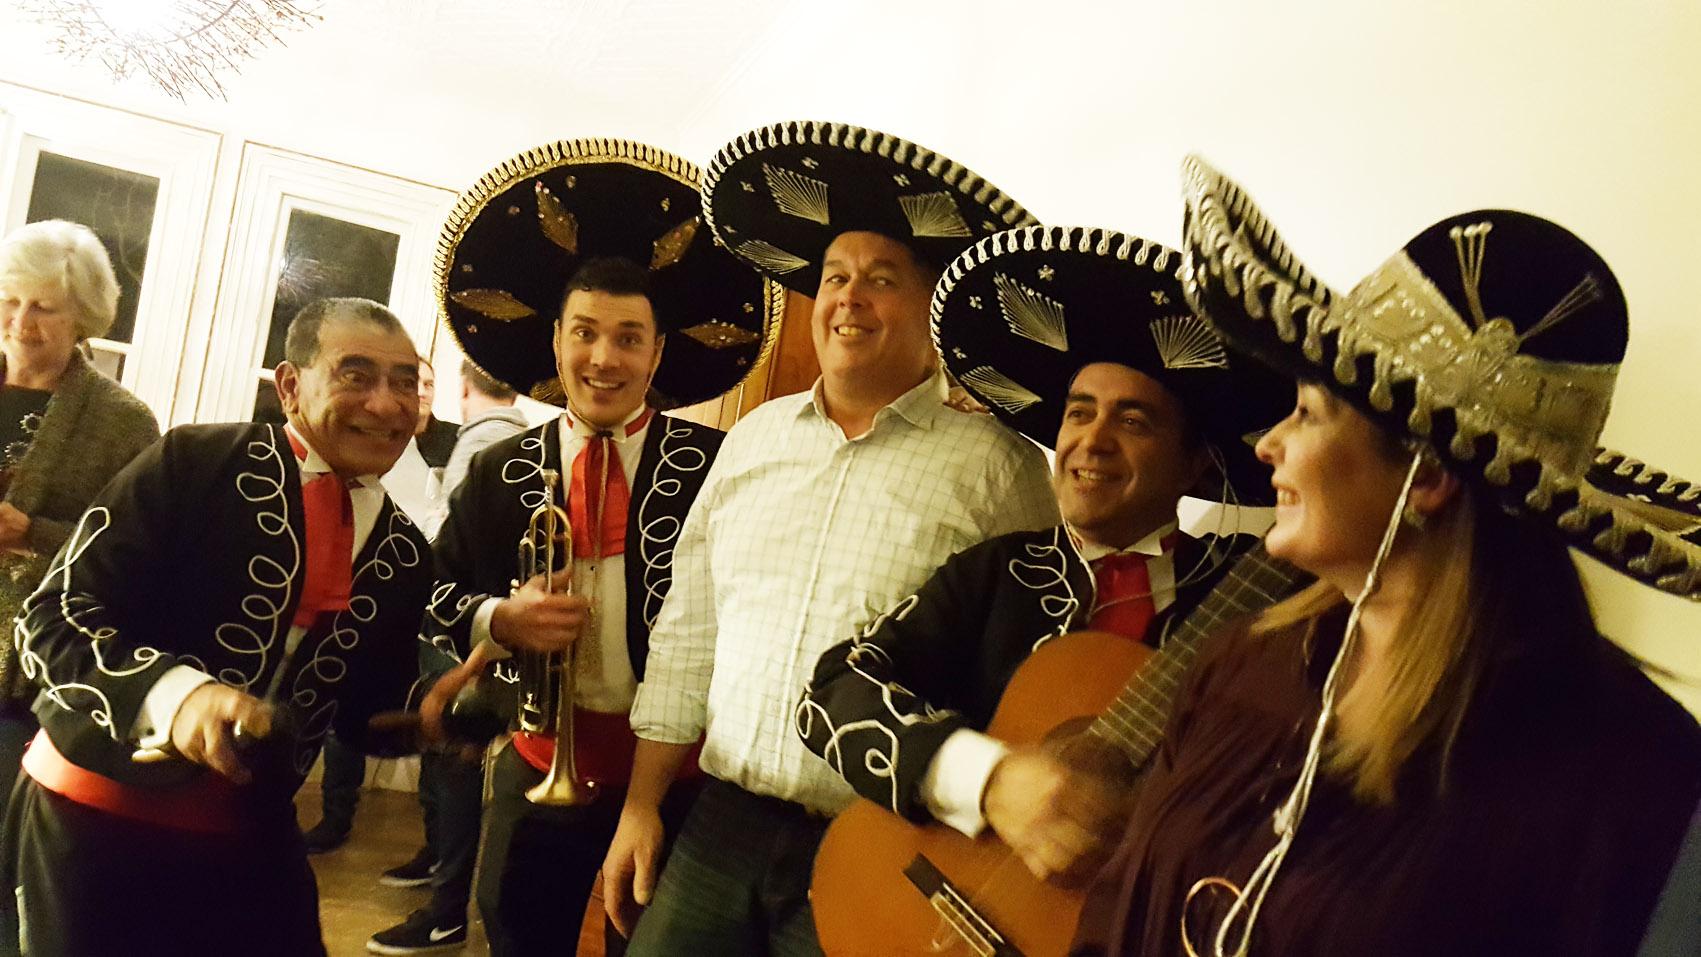 El Stanco 25th anniversary mariachi mexican band adelaide australia. perth, melbourne, sydney